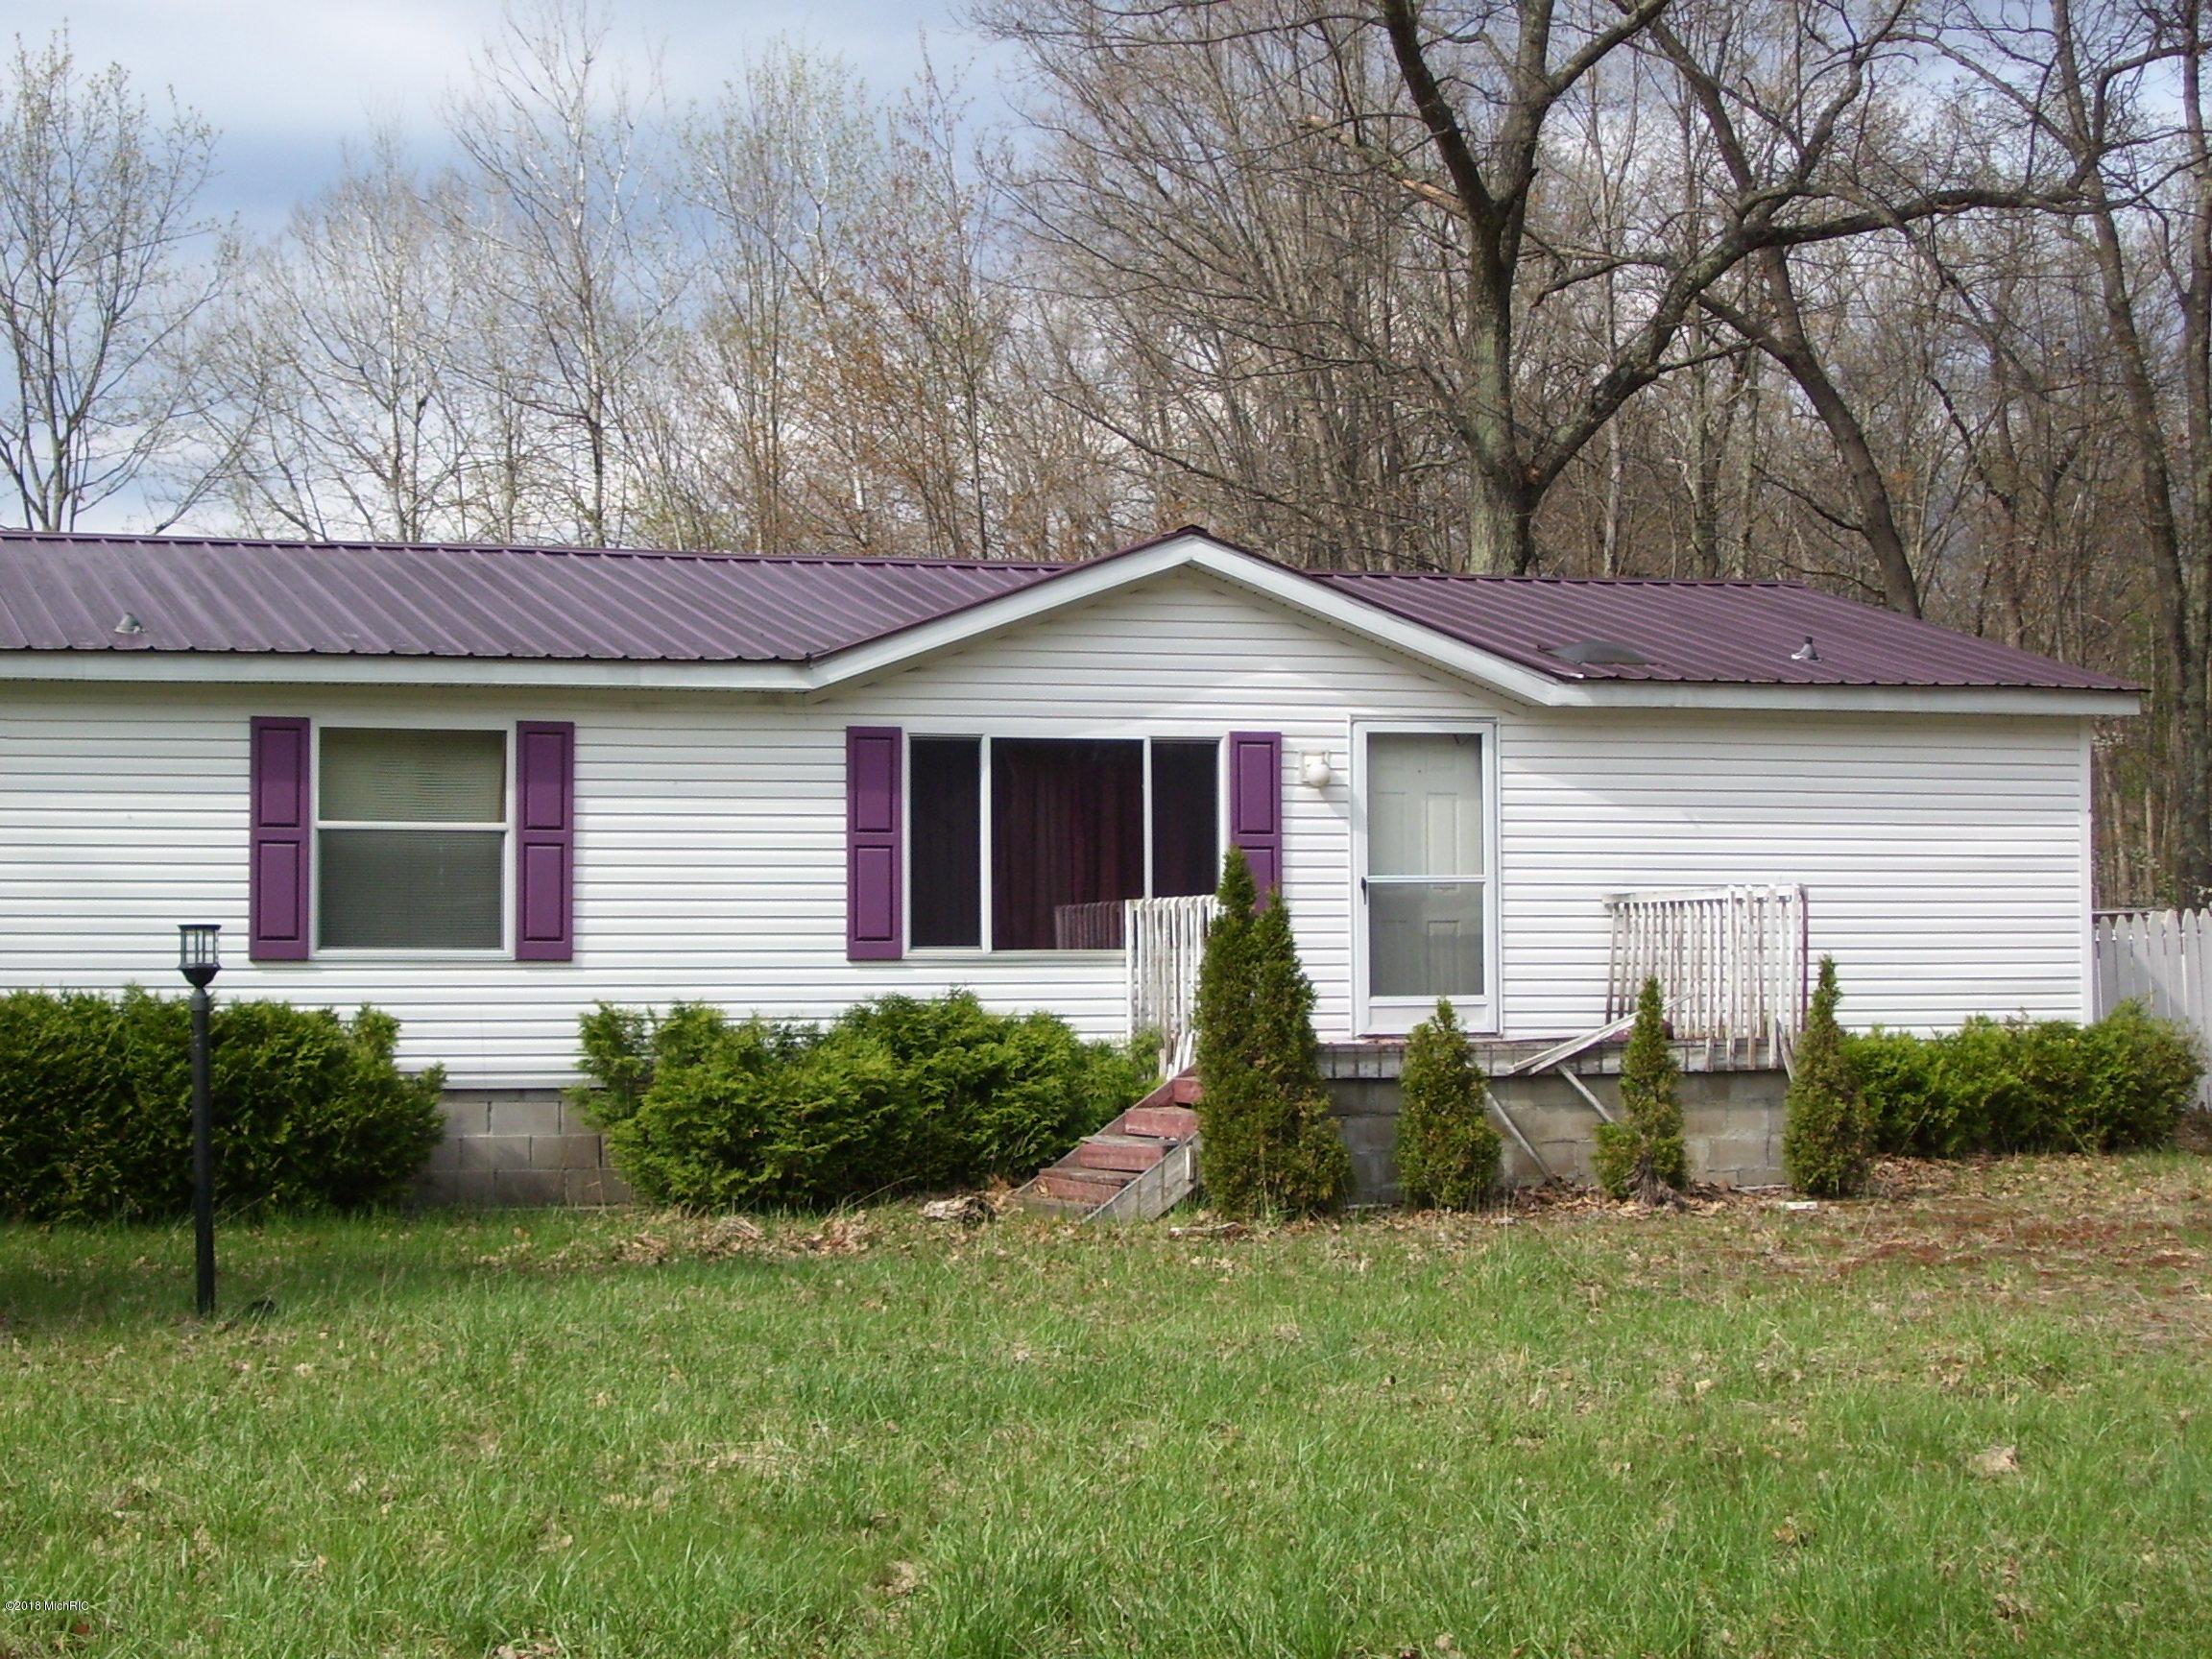 8441 N Blair, Bitely MI 49309 - House for Sale in Bitely, MI